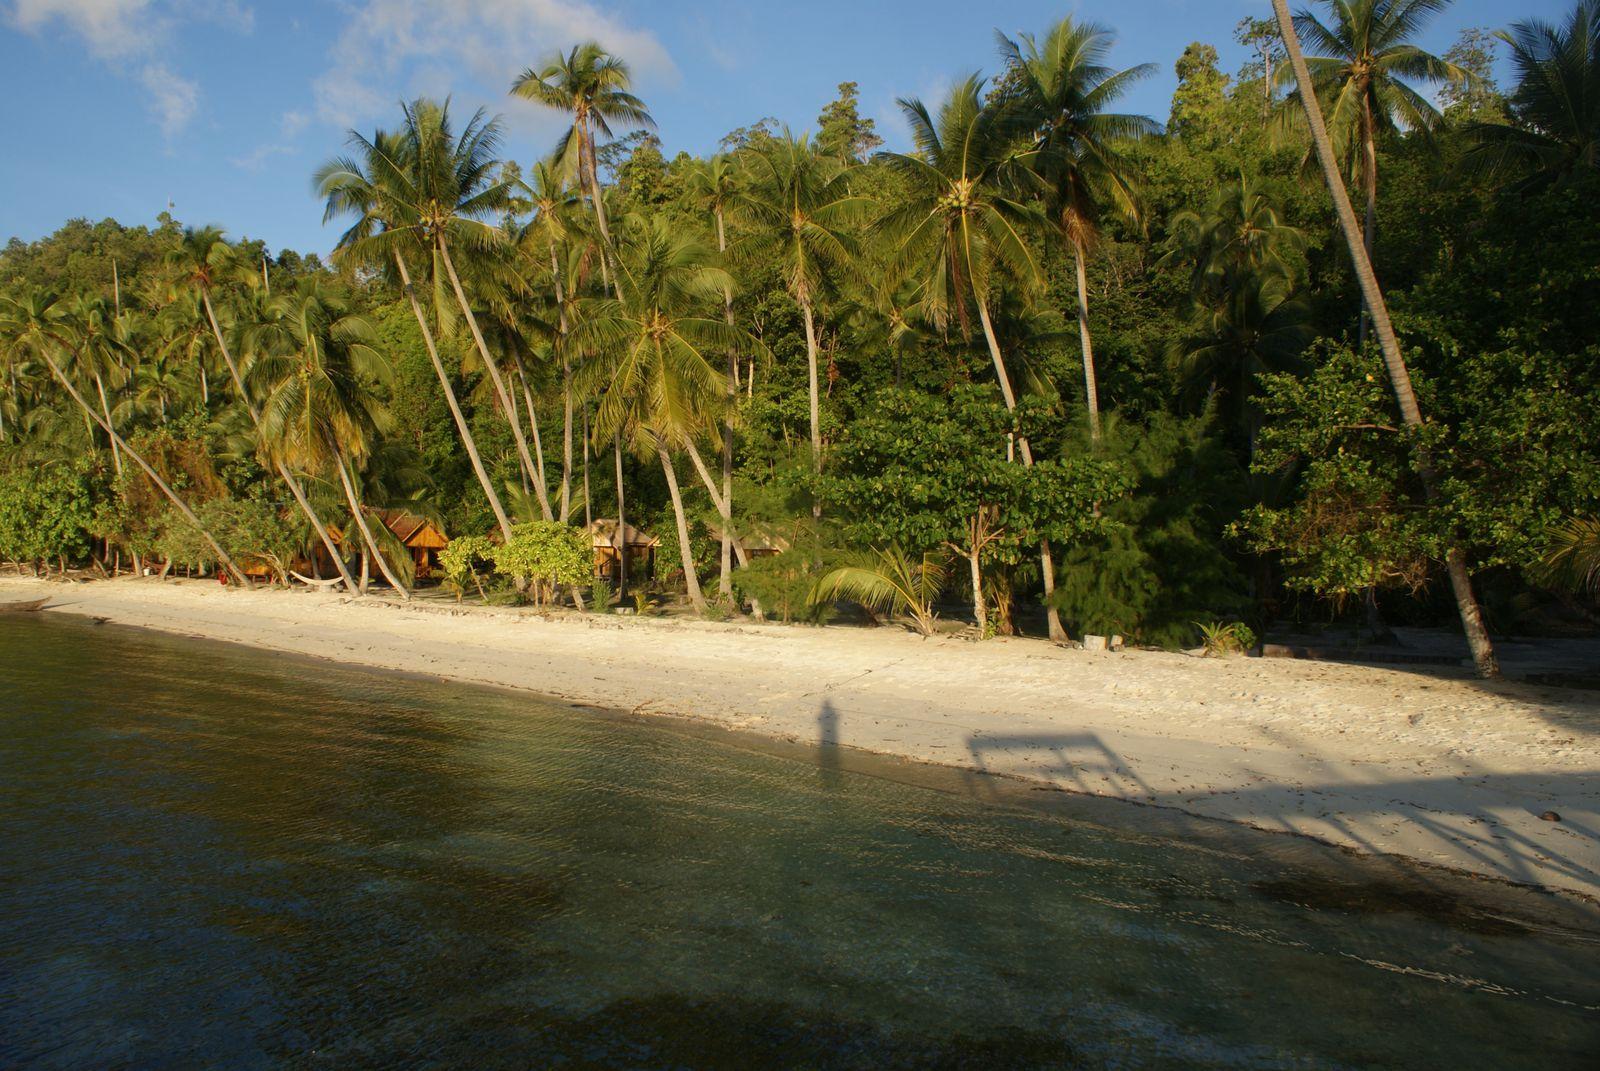 Sulawesi - Iles Togian / 4